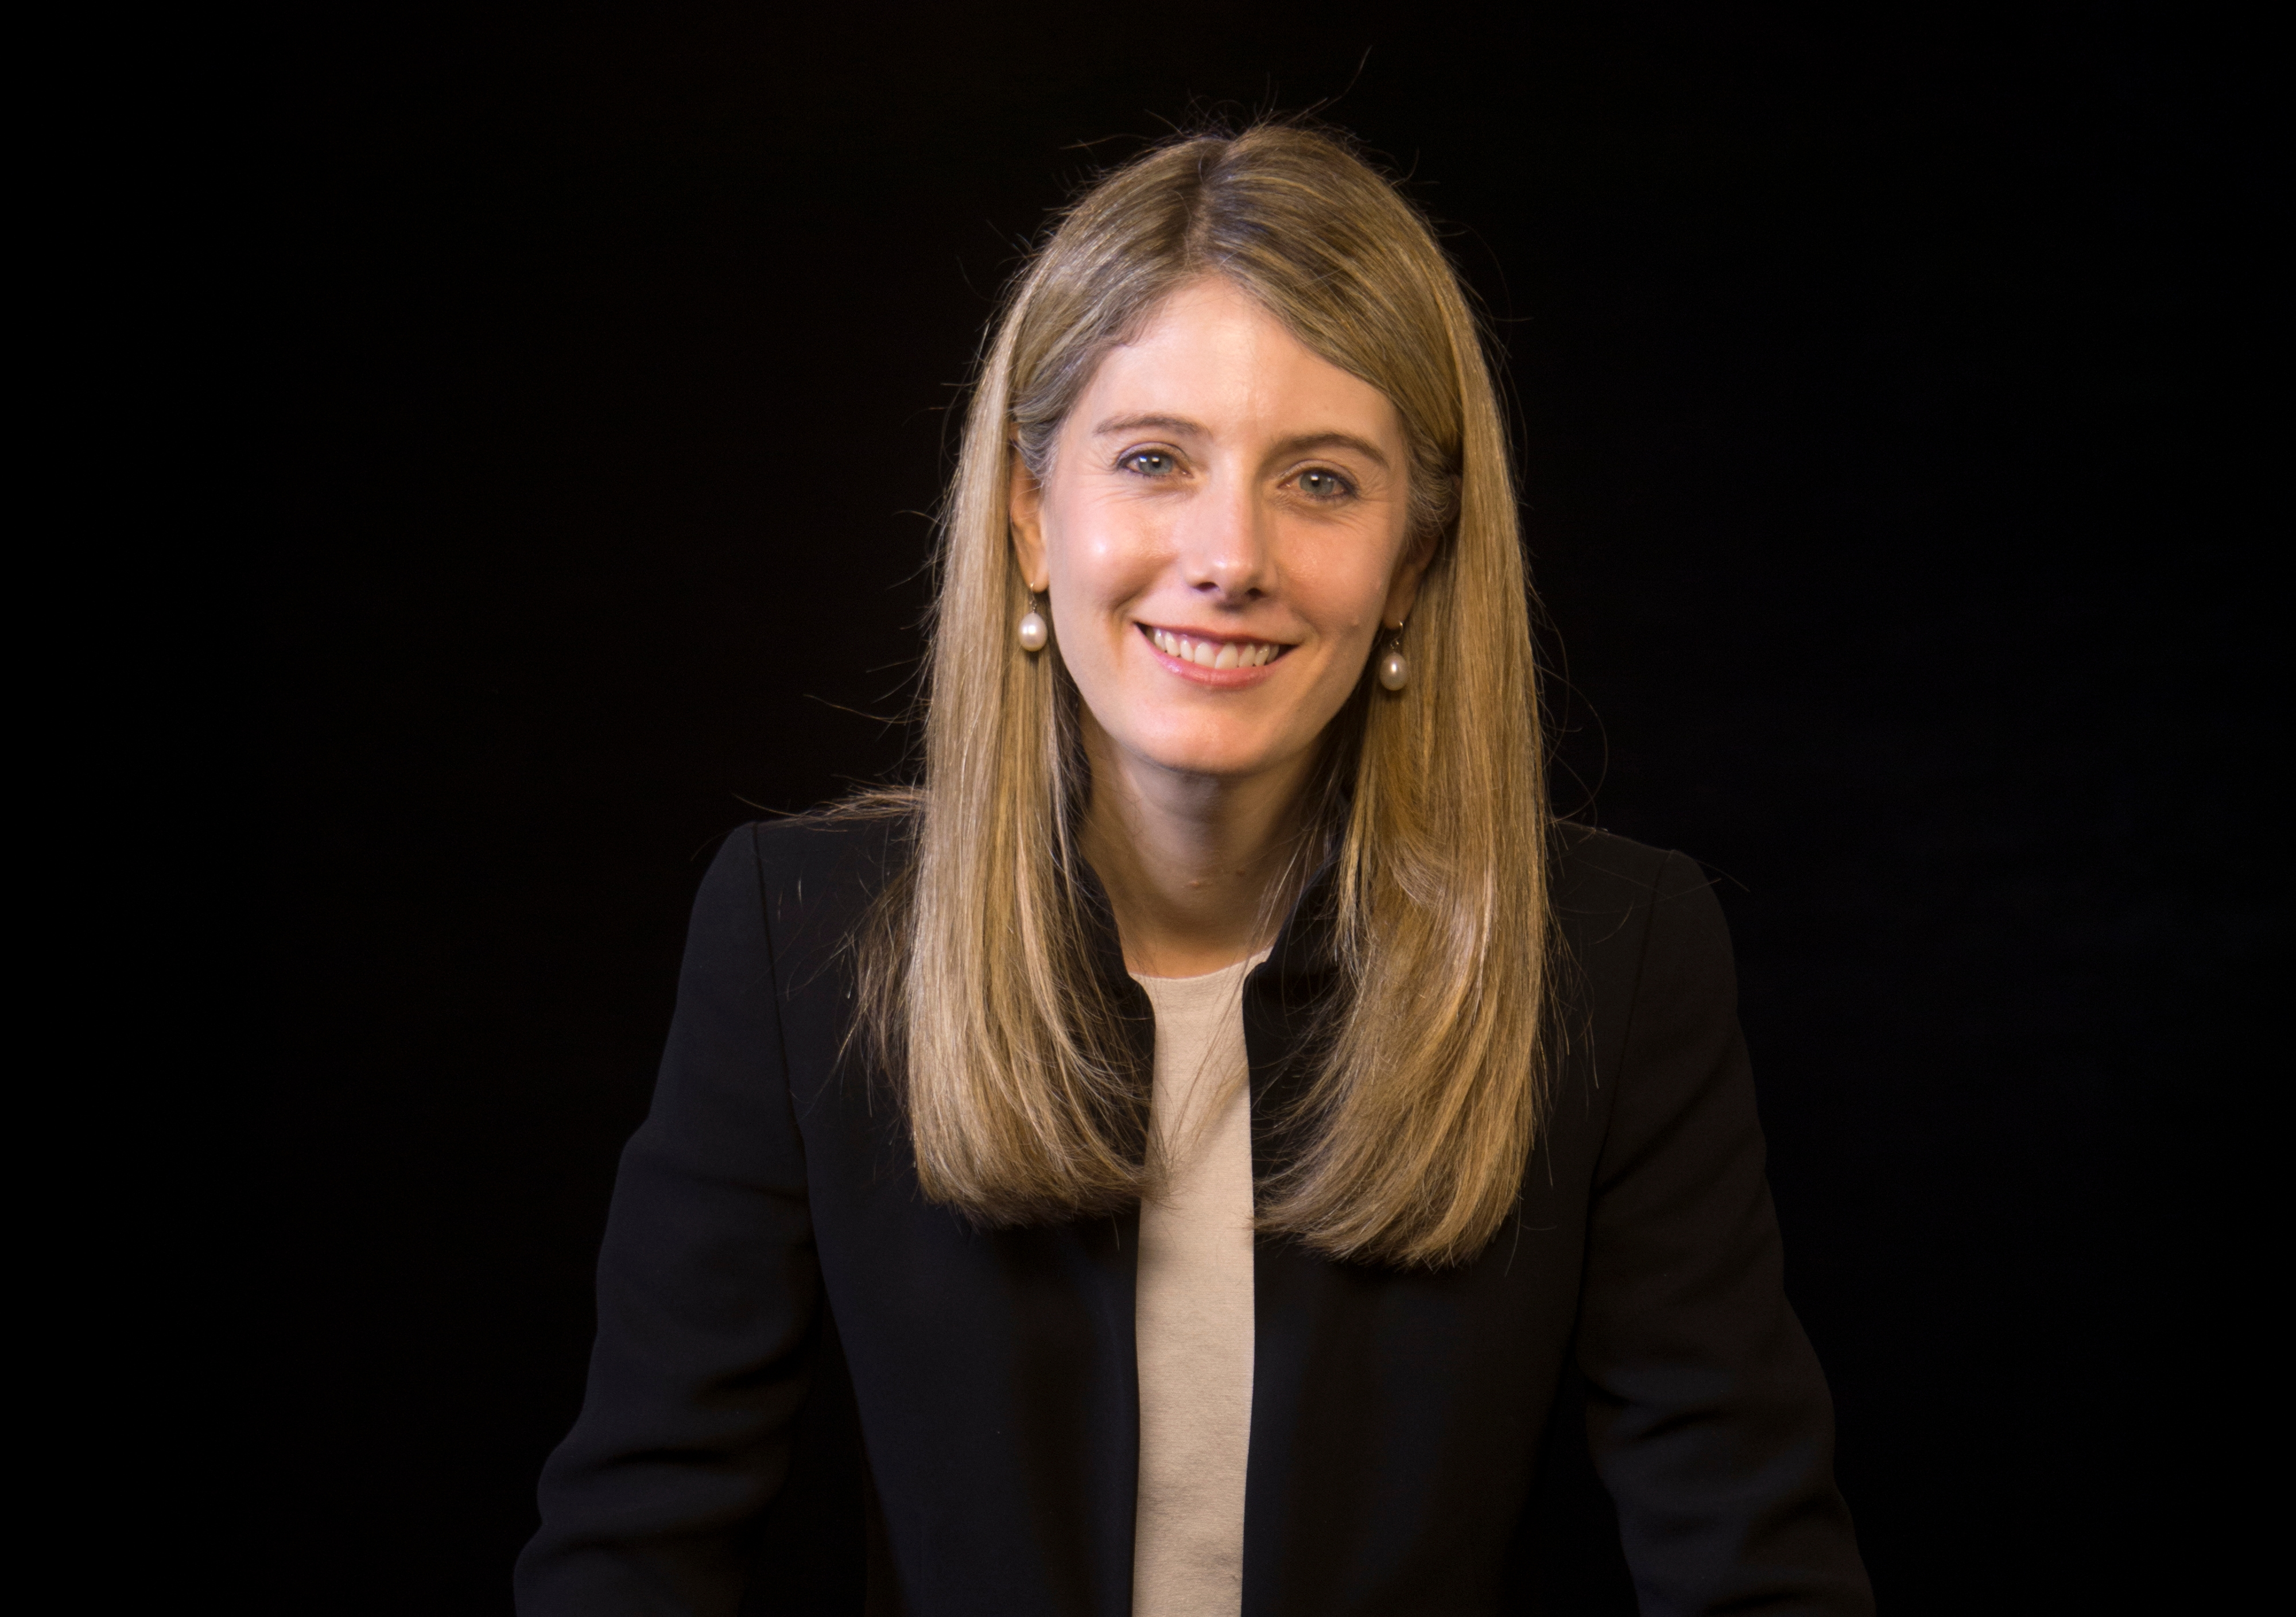 Scienta Professor Jane McAdam, Director of the Andrew & Renata Kaldor Centre for International Refugee Law.